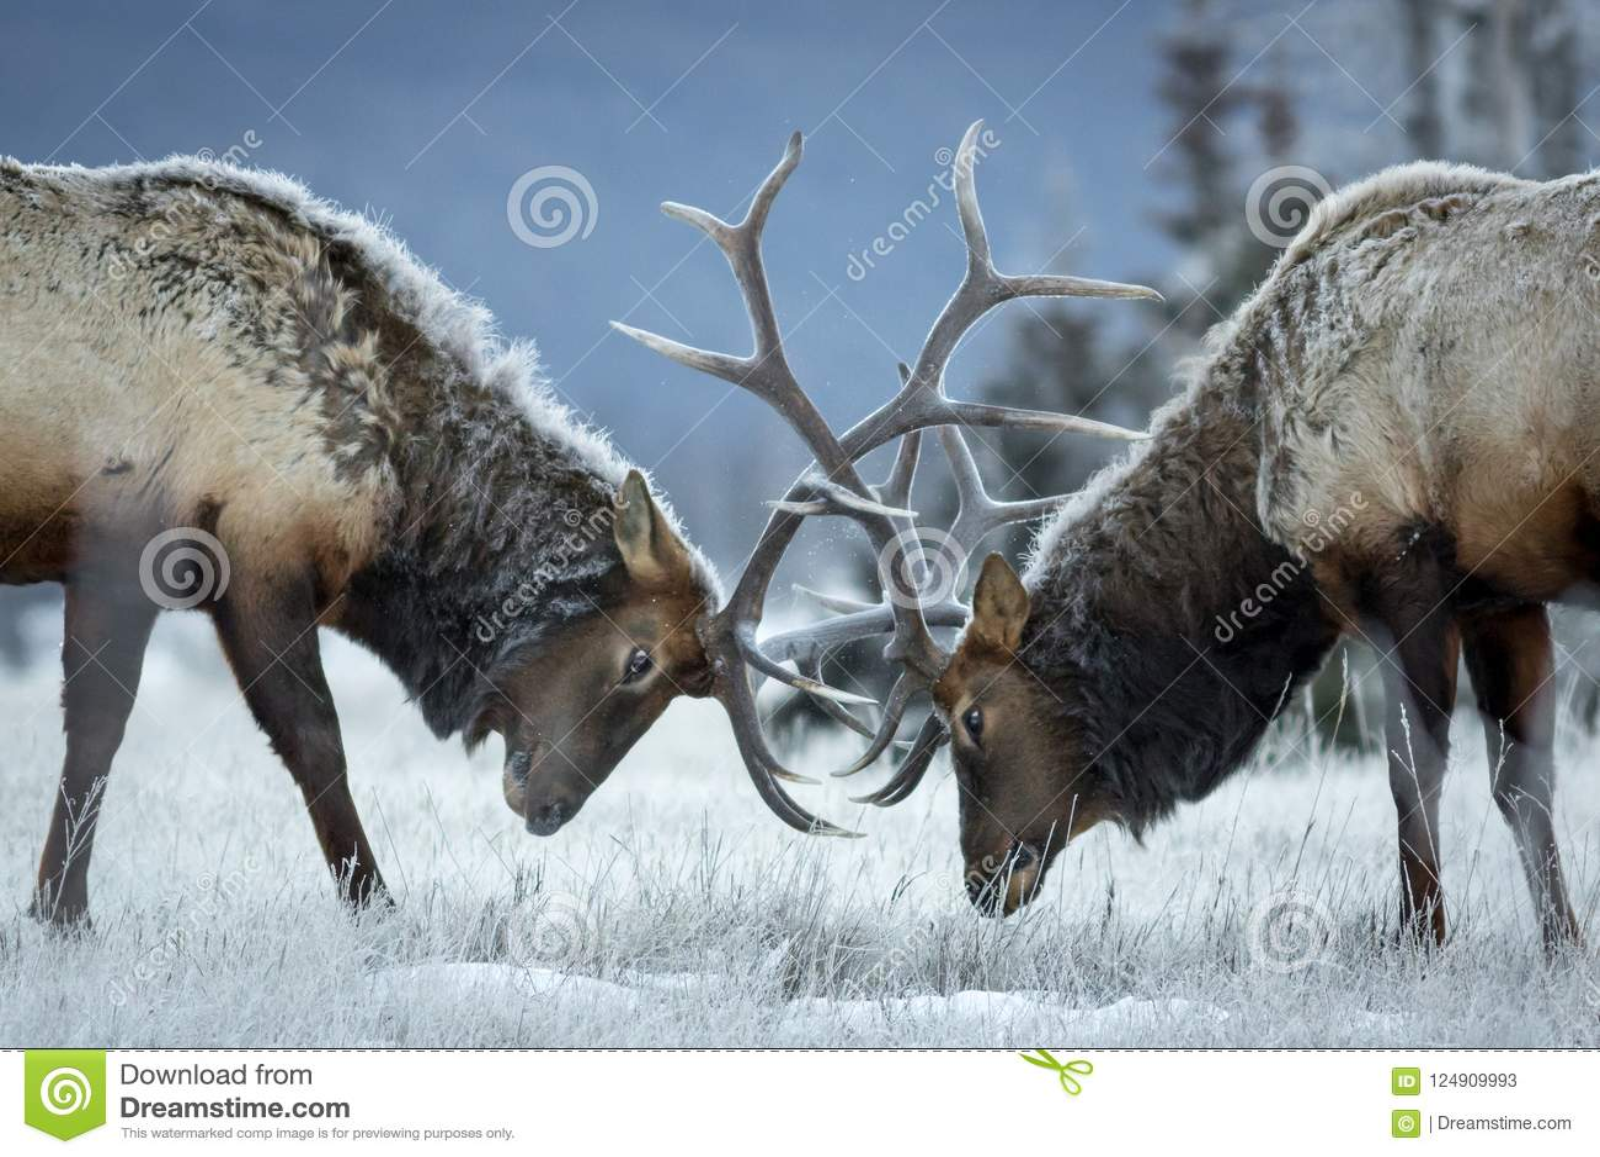 Big bull elk locking heads.